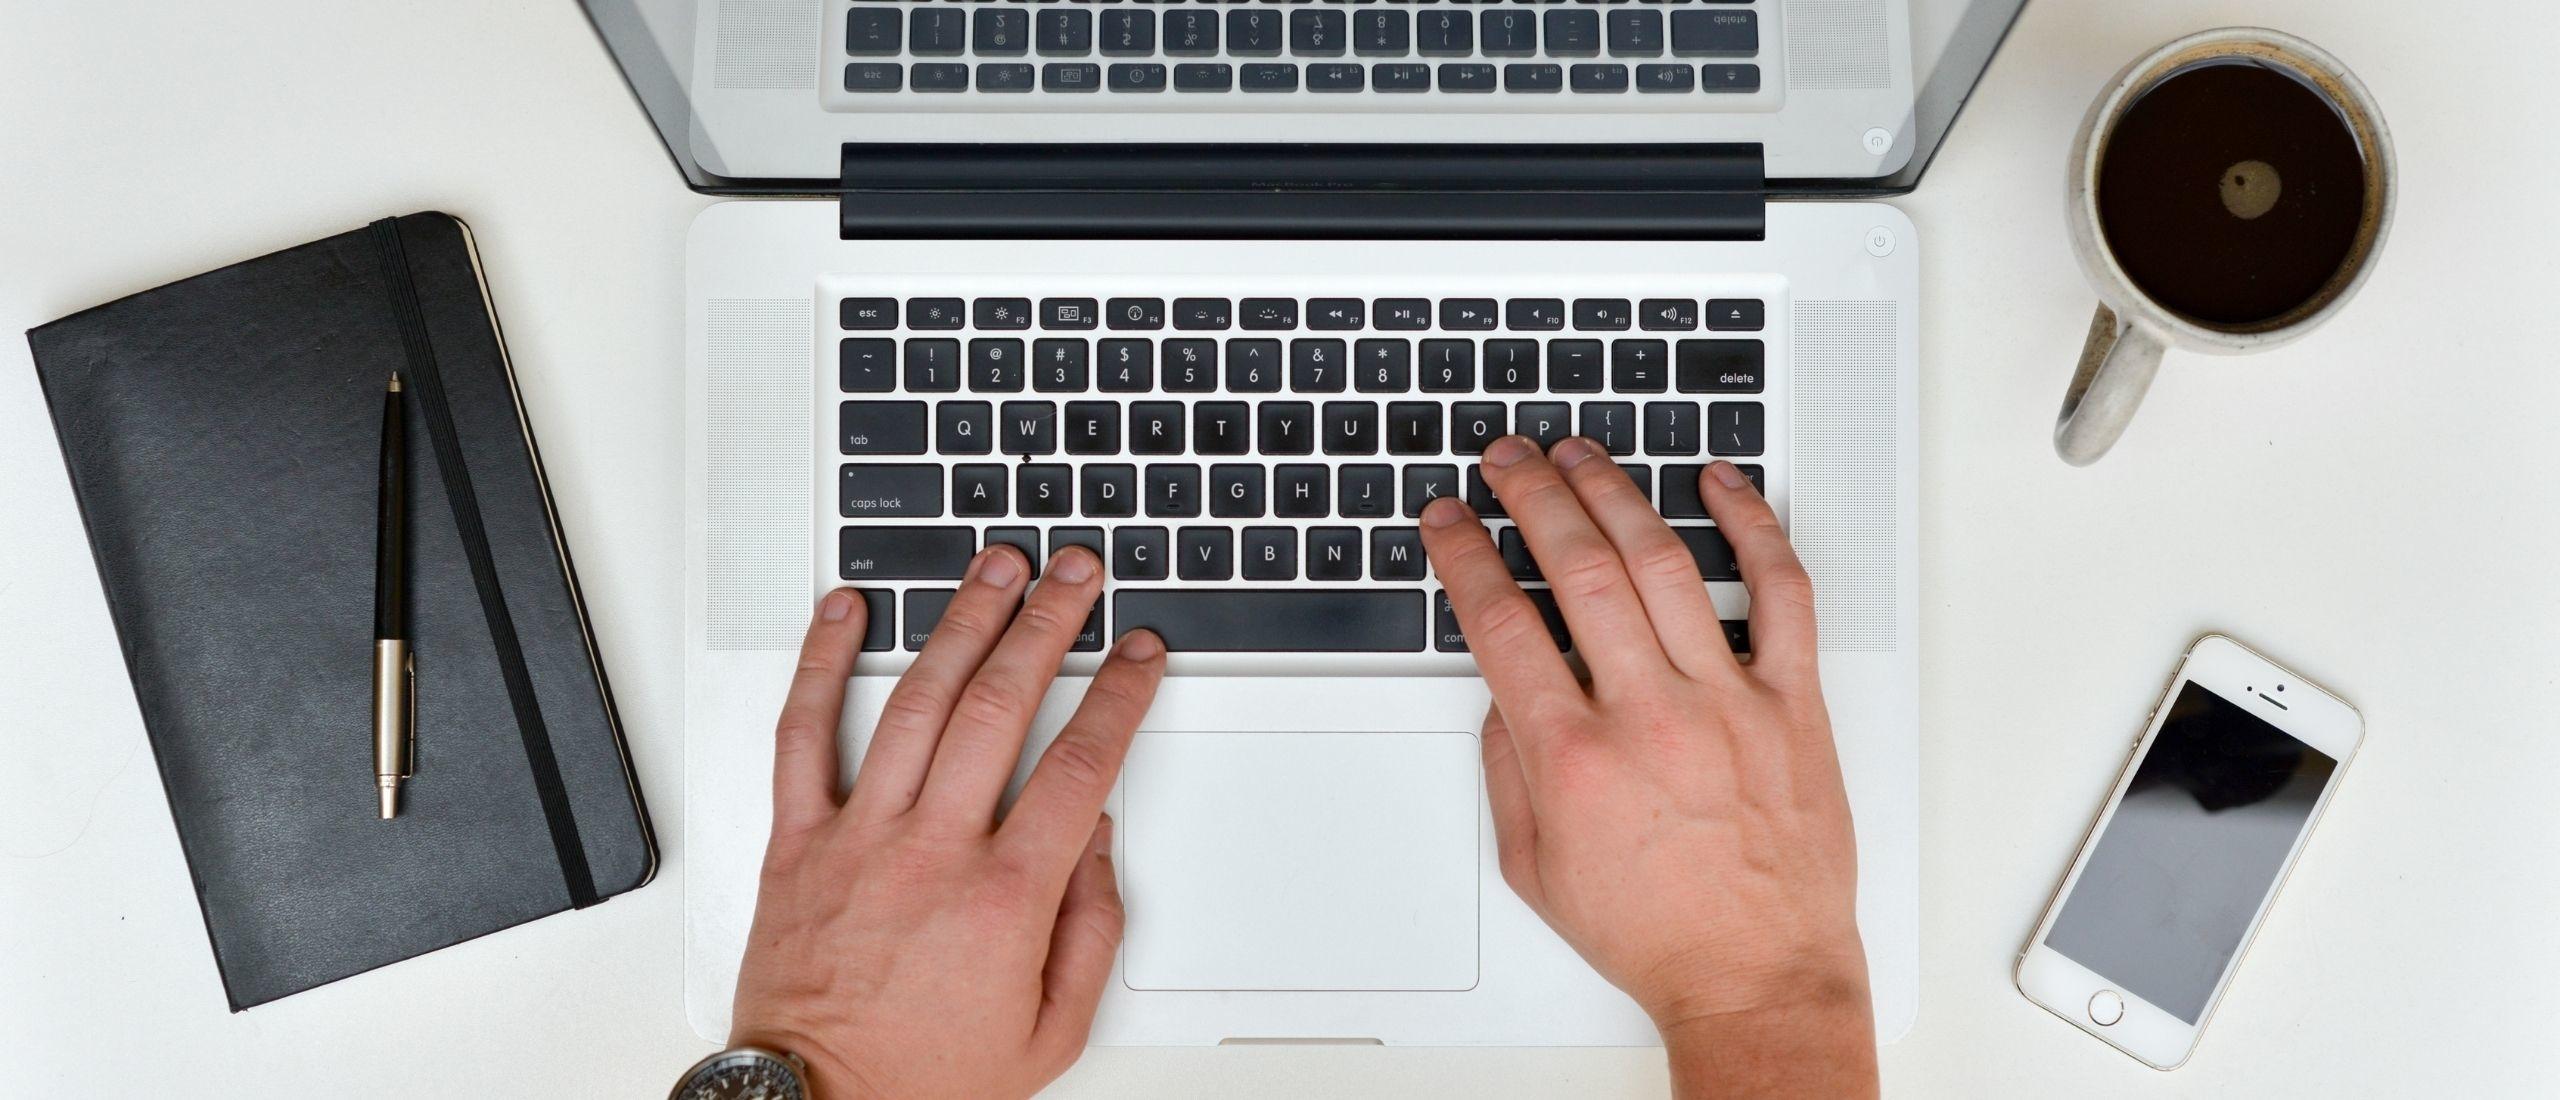 Je blog vindbaarheid verbeteren?